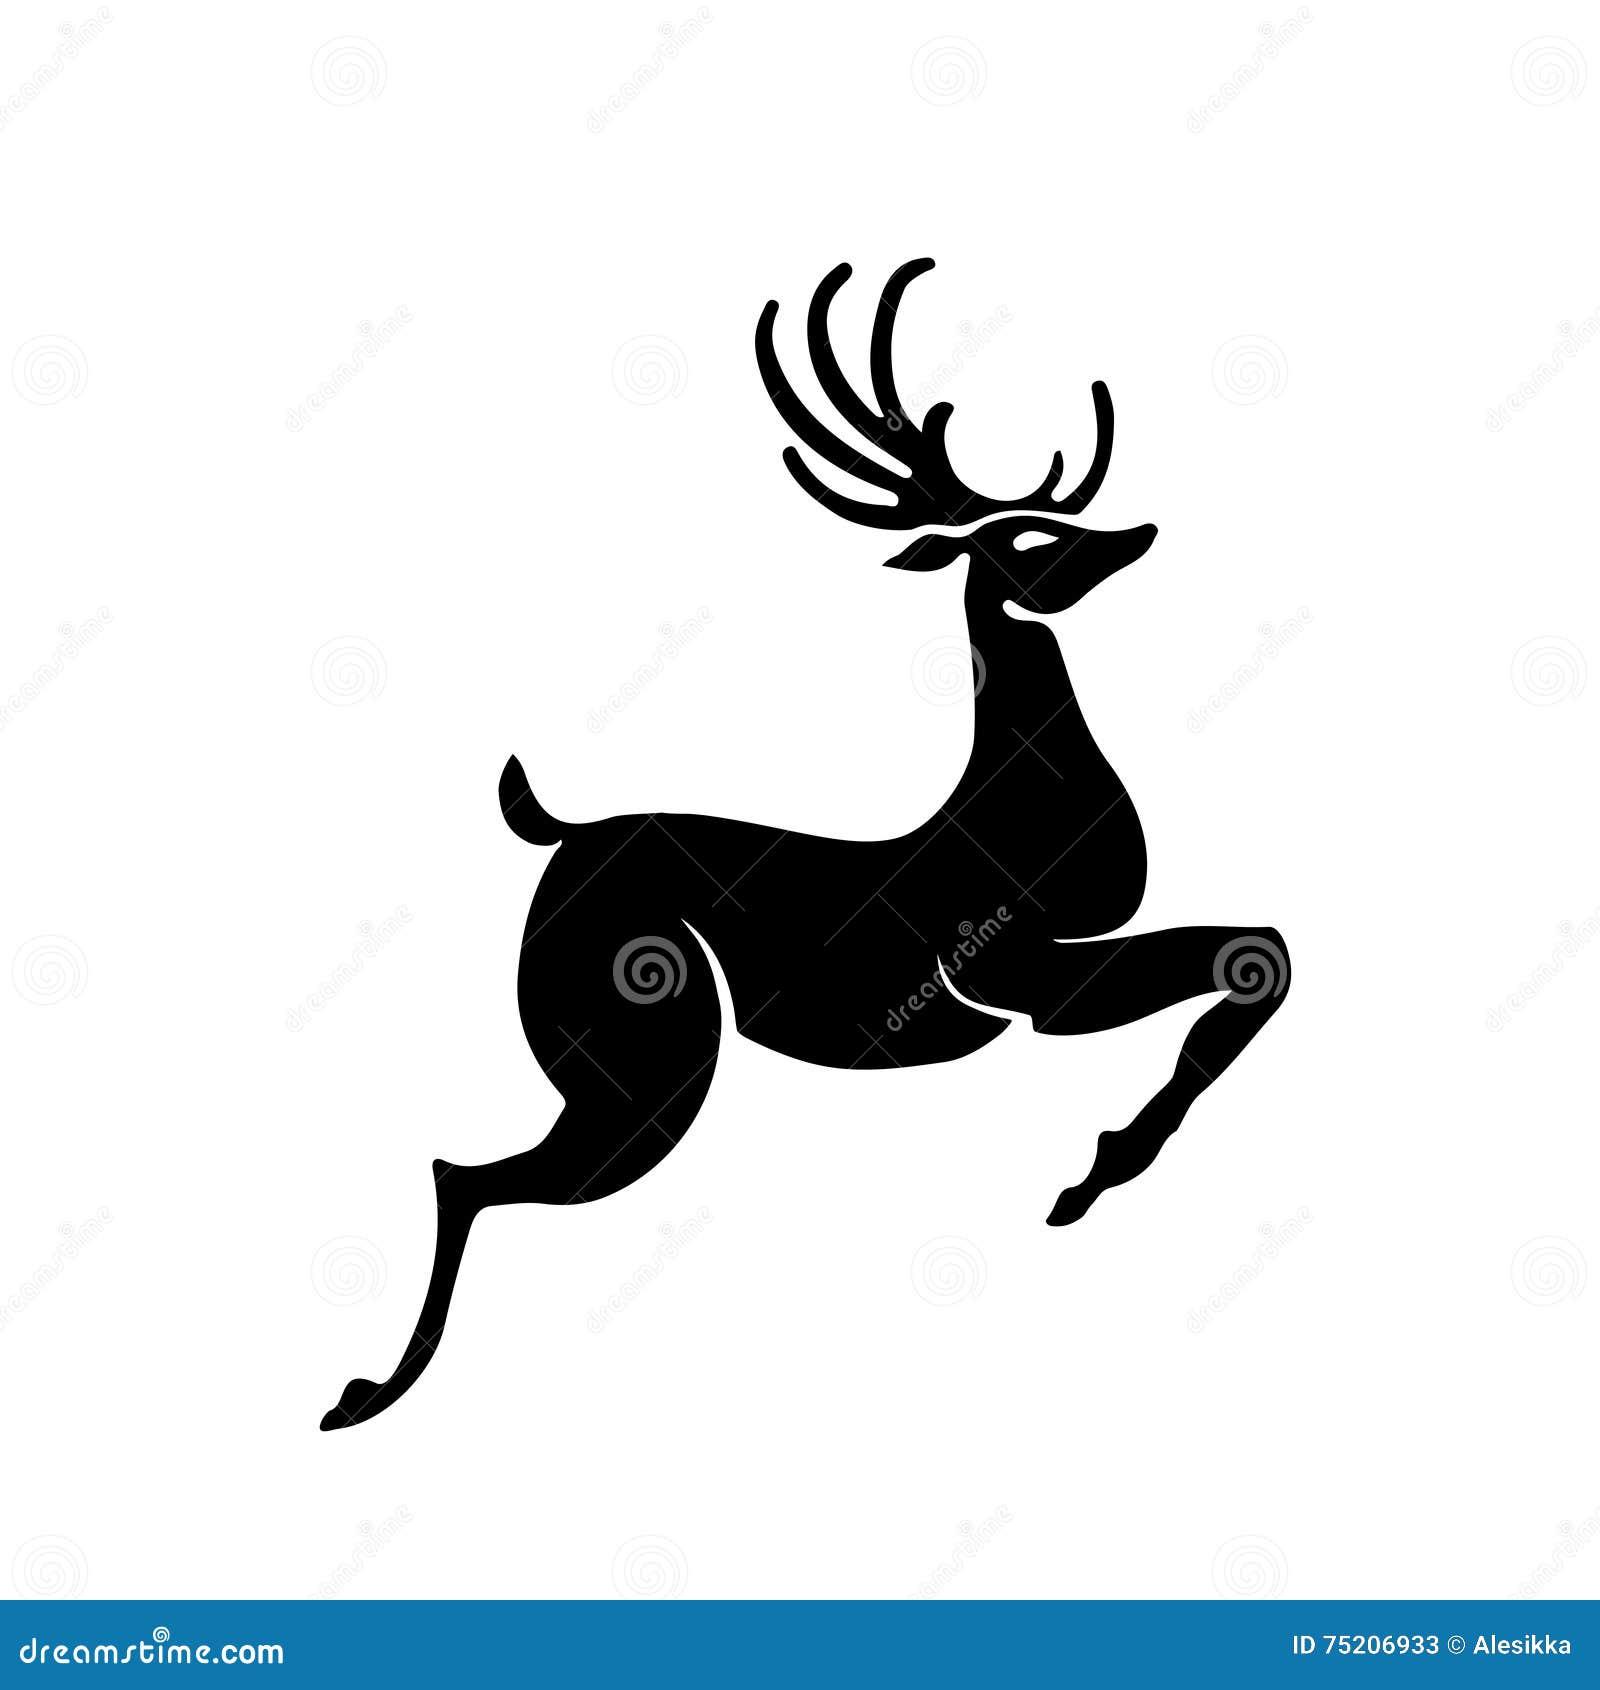 Christmas Reindeer Silhouette.Christmas Reindeer Silhouette Stock Vector Illustration Of